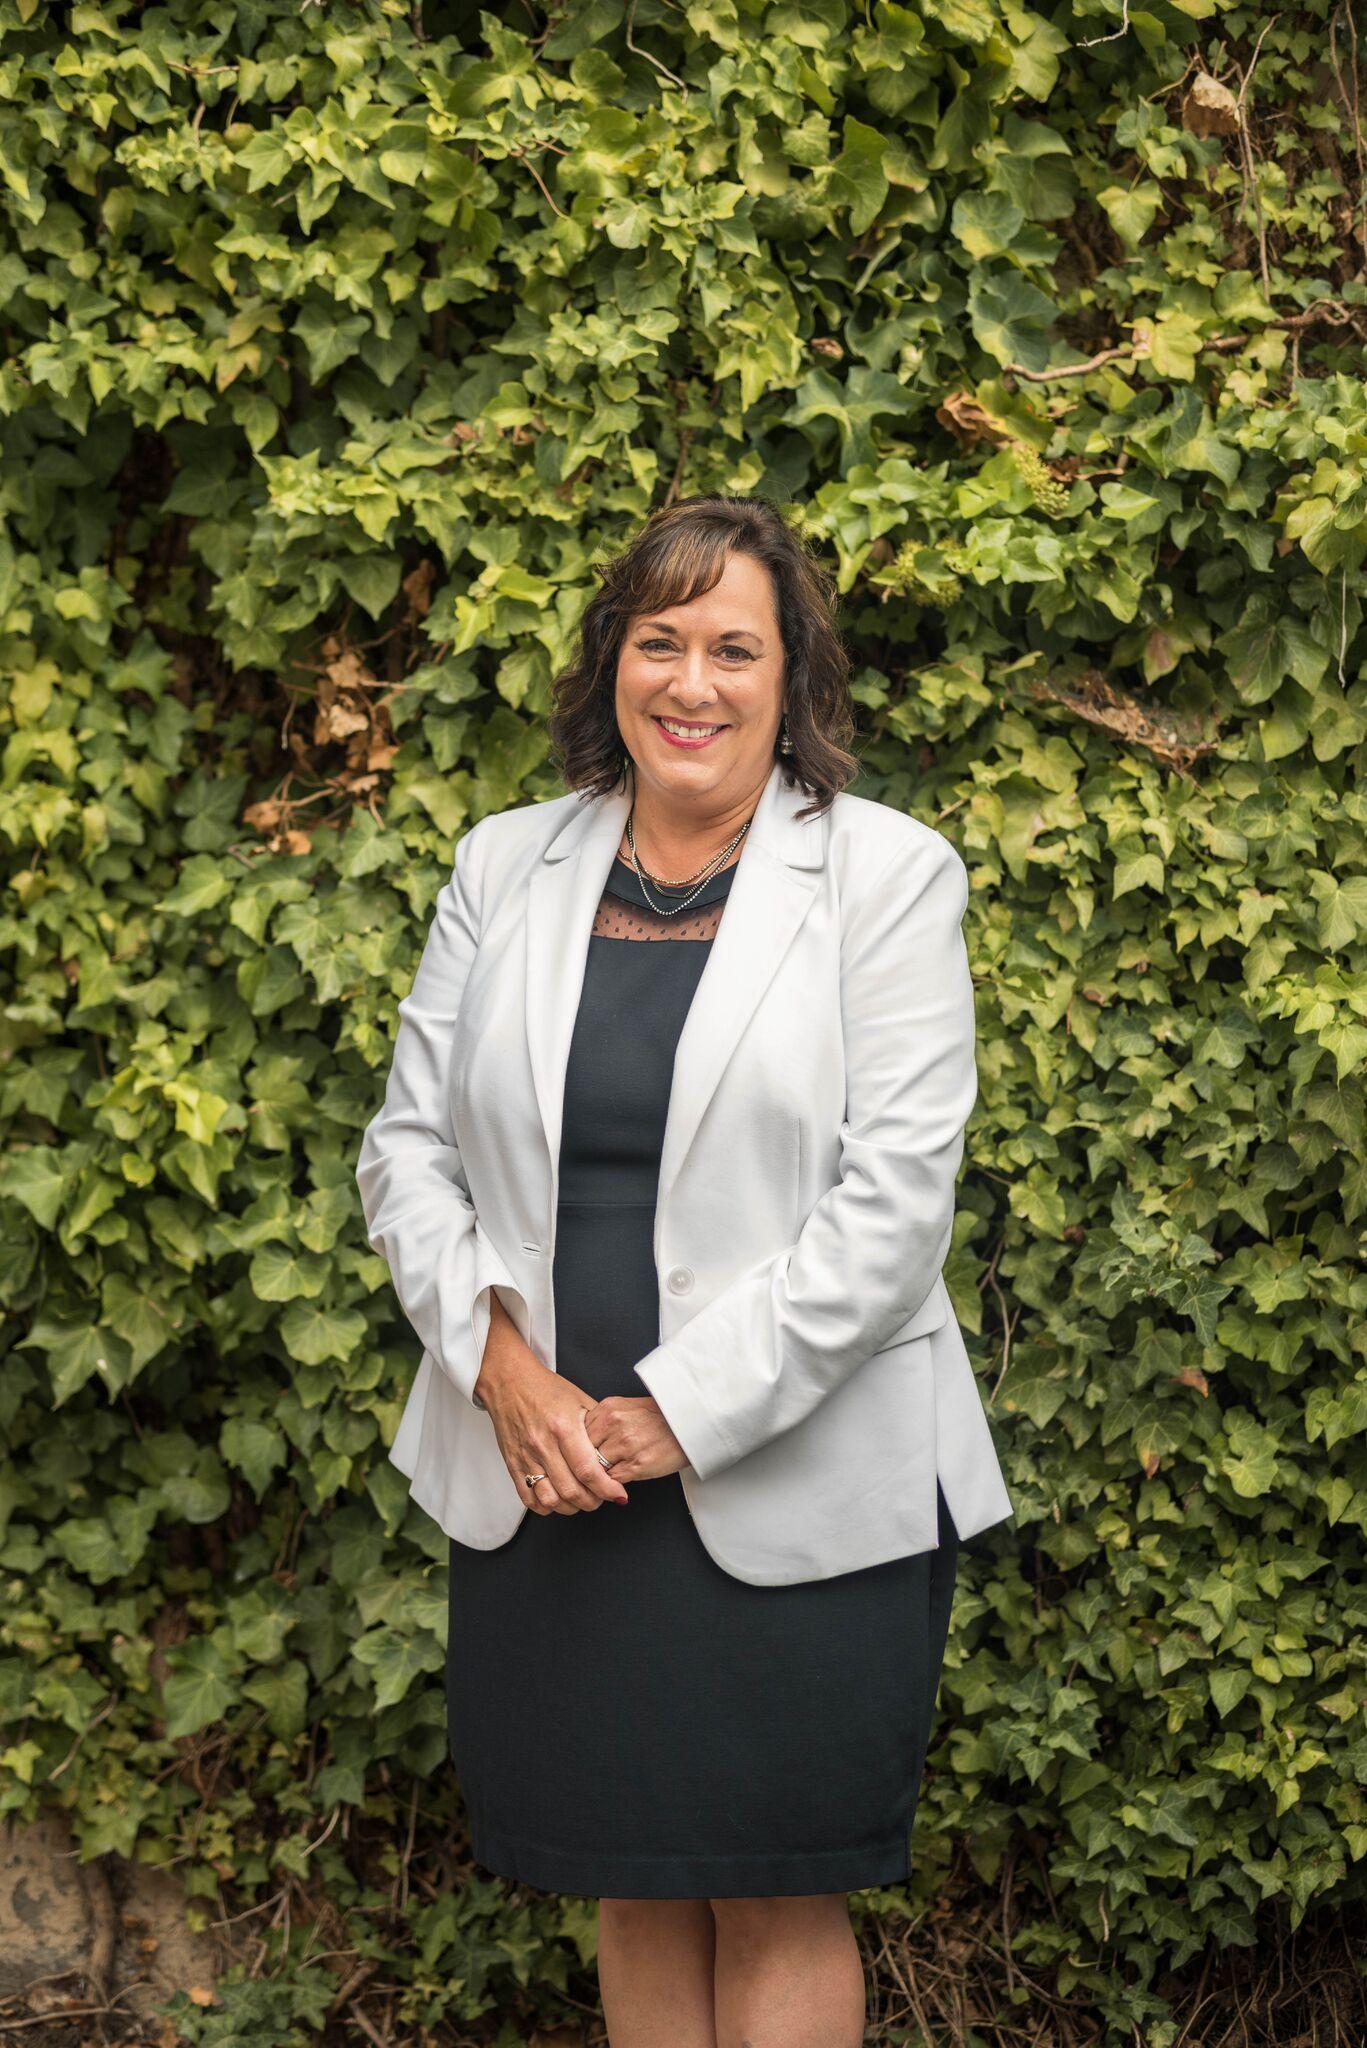 Lisa Pogue  Owner + Managing Broker of DC Lending